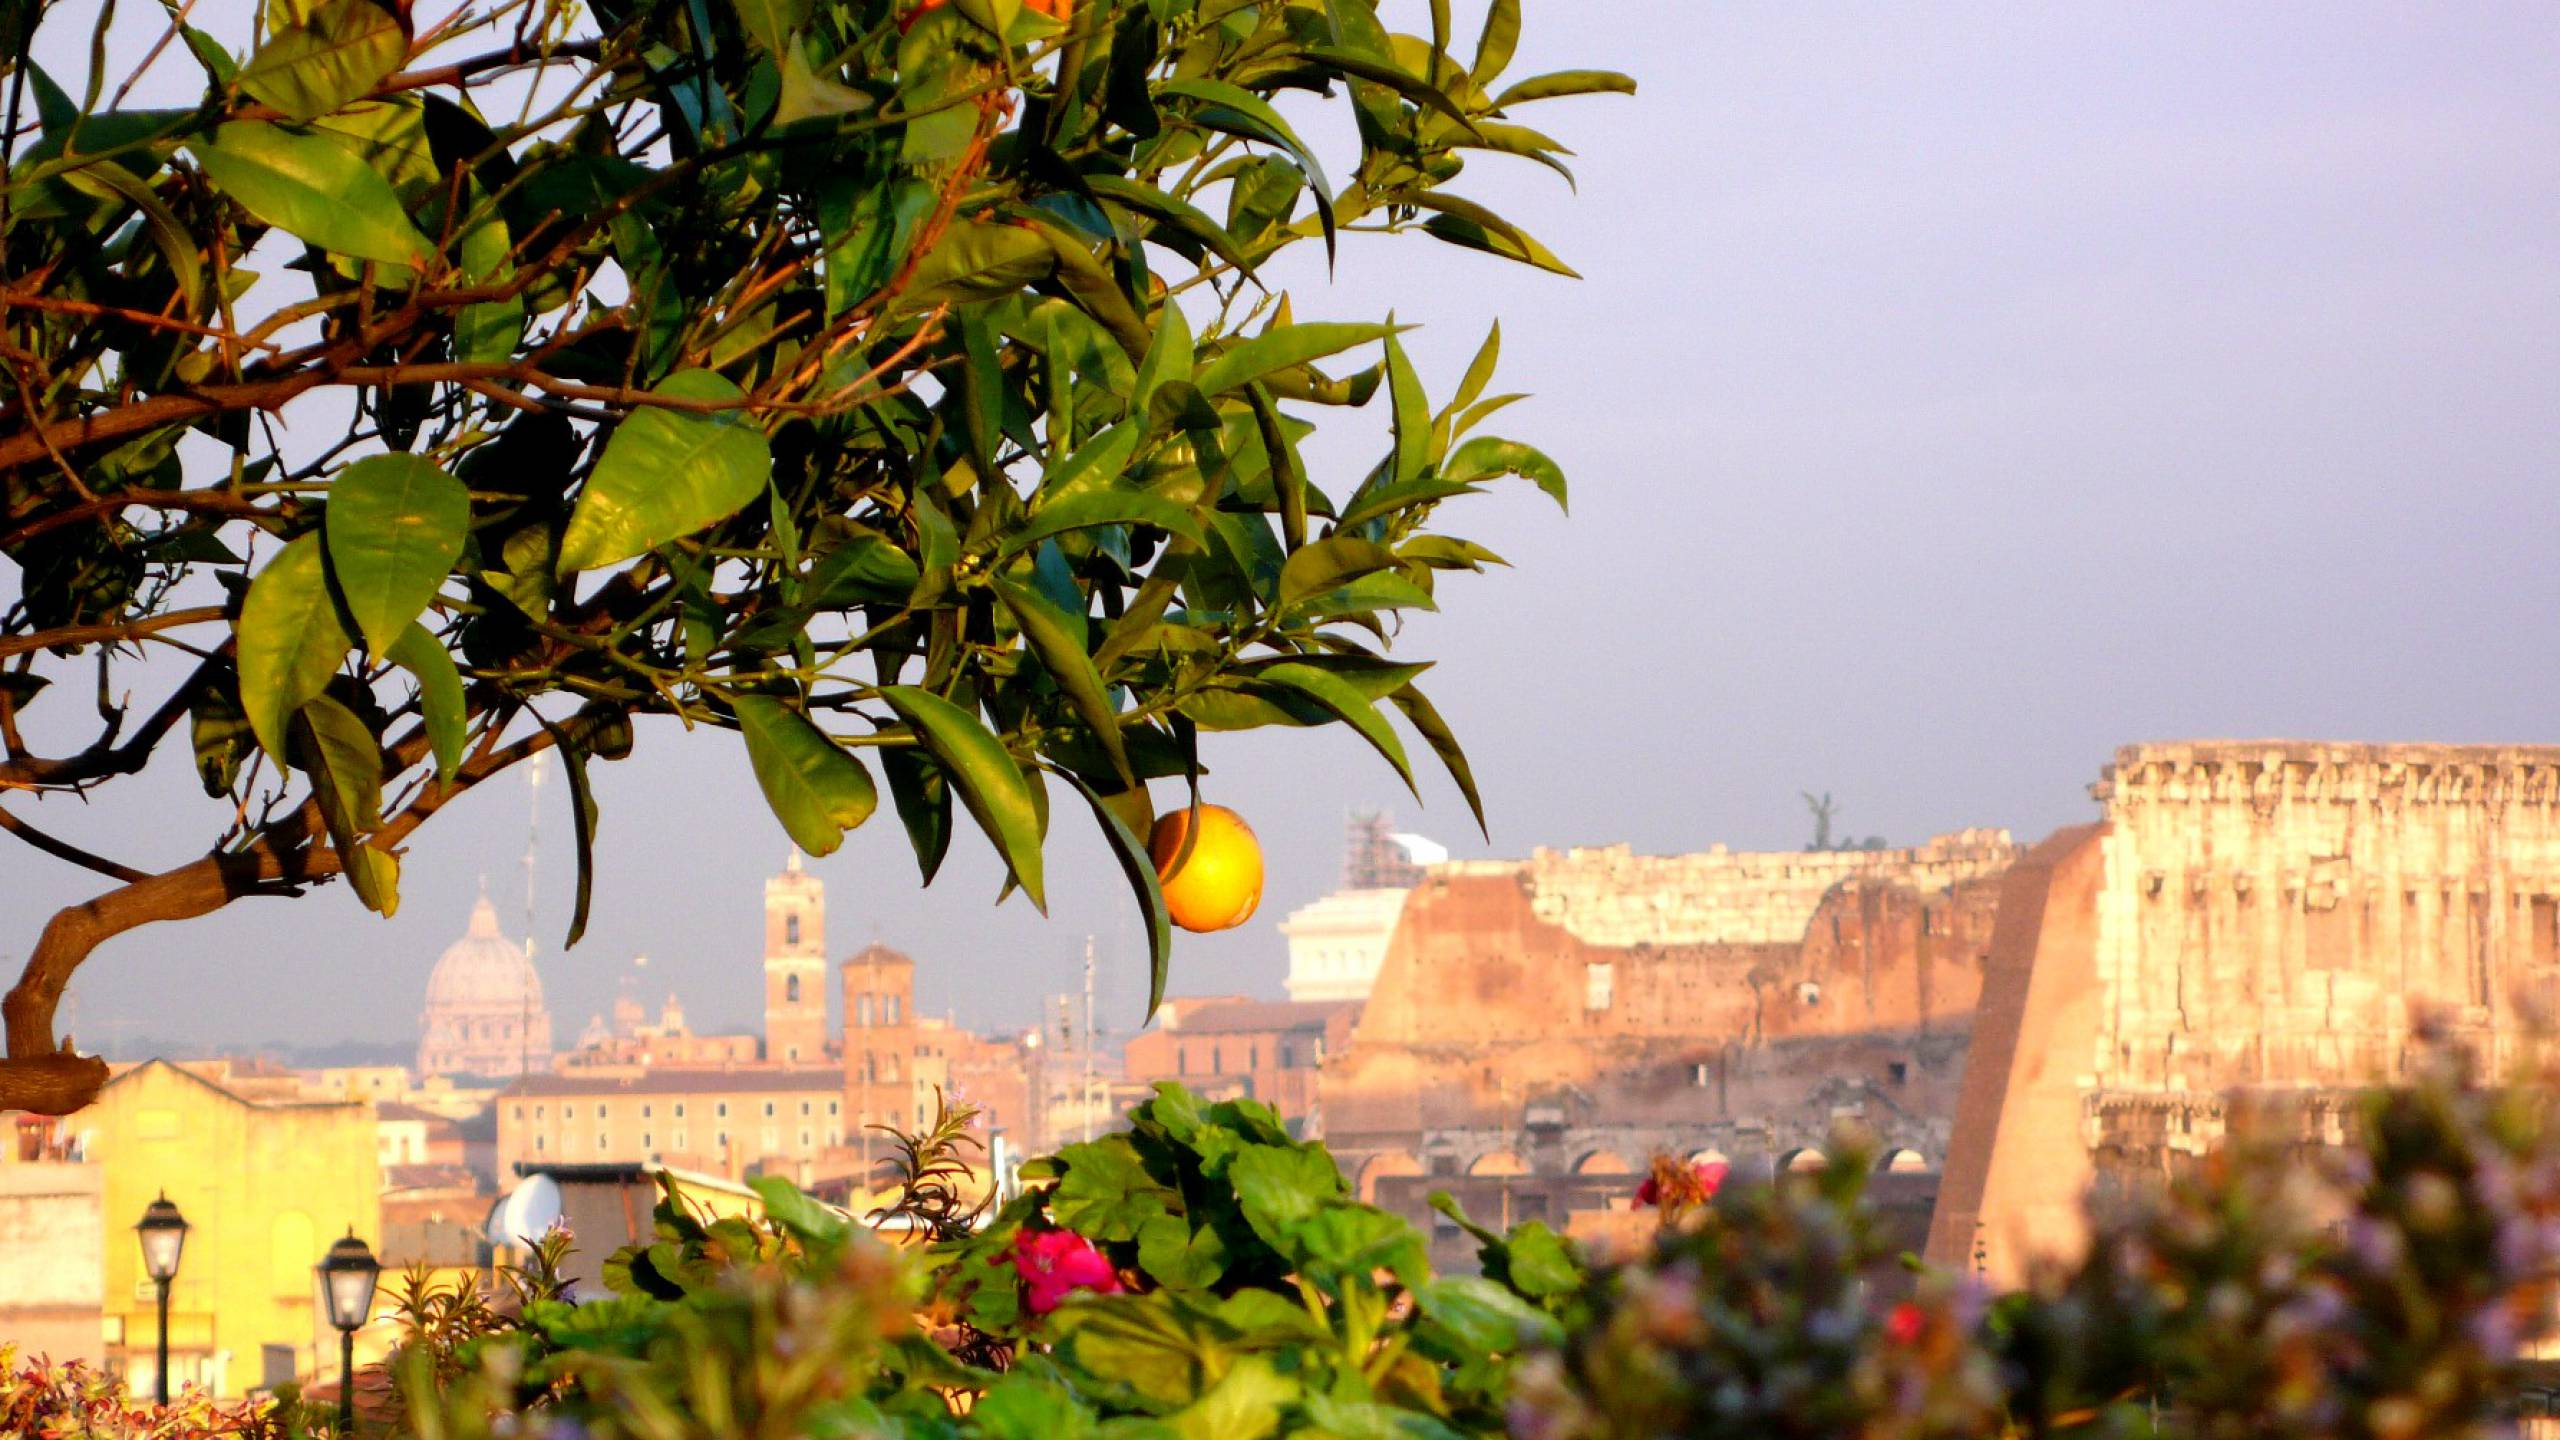 Colosseumview